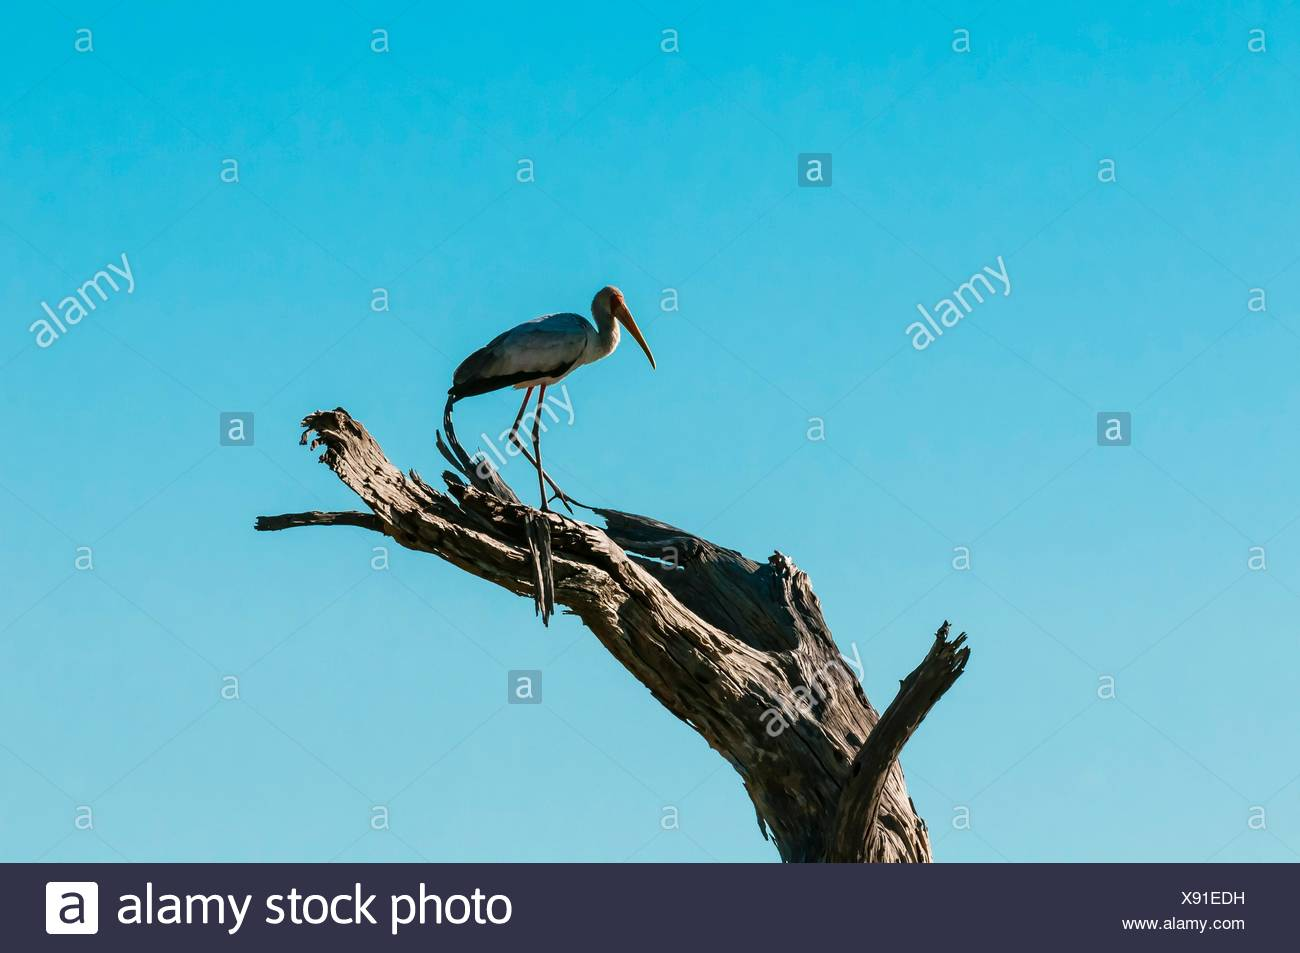 A Yellow Billed Stork standing on branch, Kwando Concession, Linyanti Marshes, Botswana. Kwando Concession, Linyanti Marshes, Stock Photo